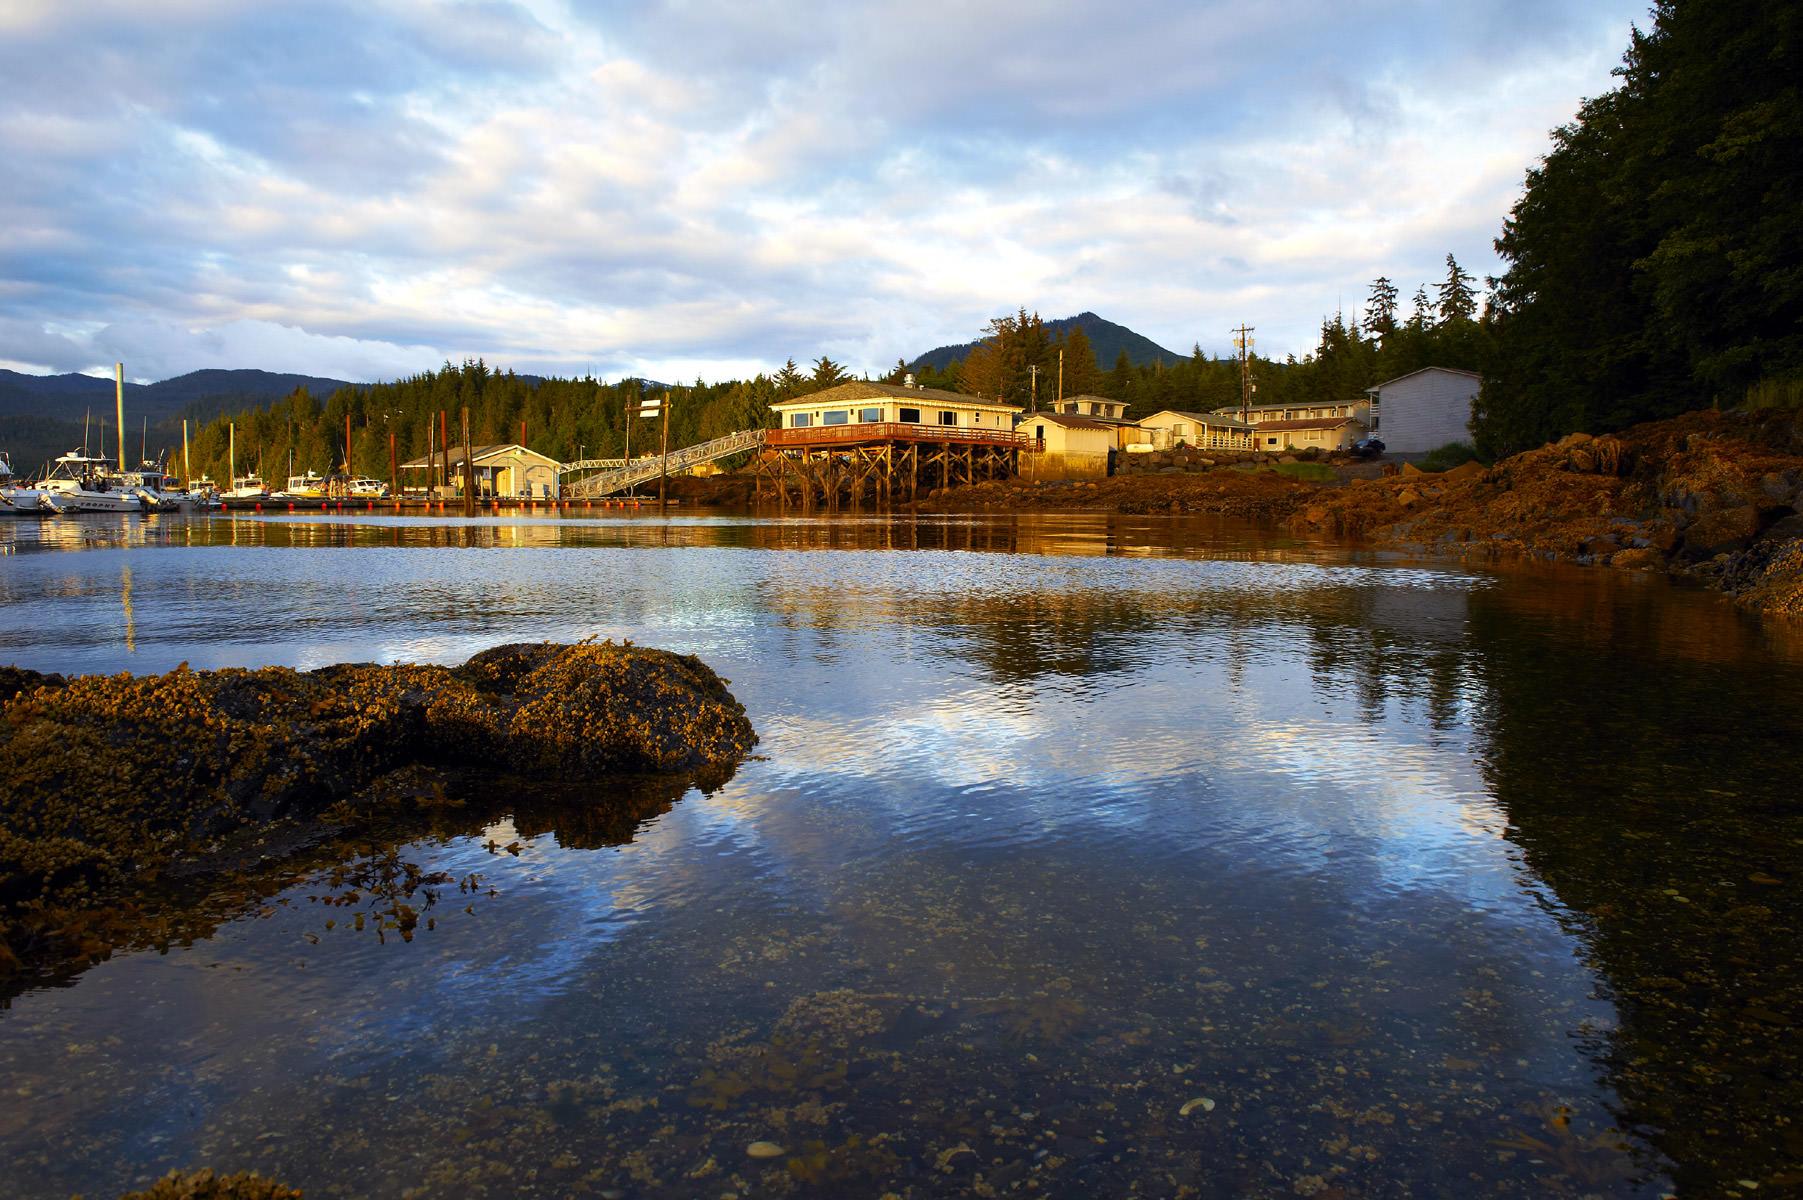 Alaska fishing lodge charter fishing in ketchikan alaska for Best fishing lodges in alaska